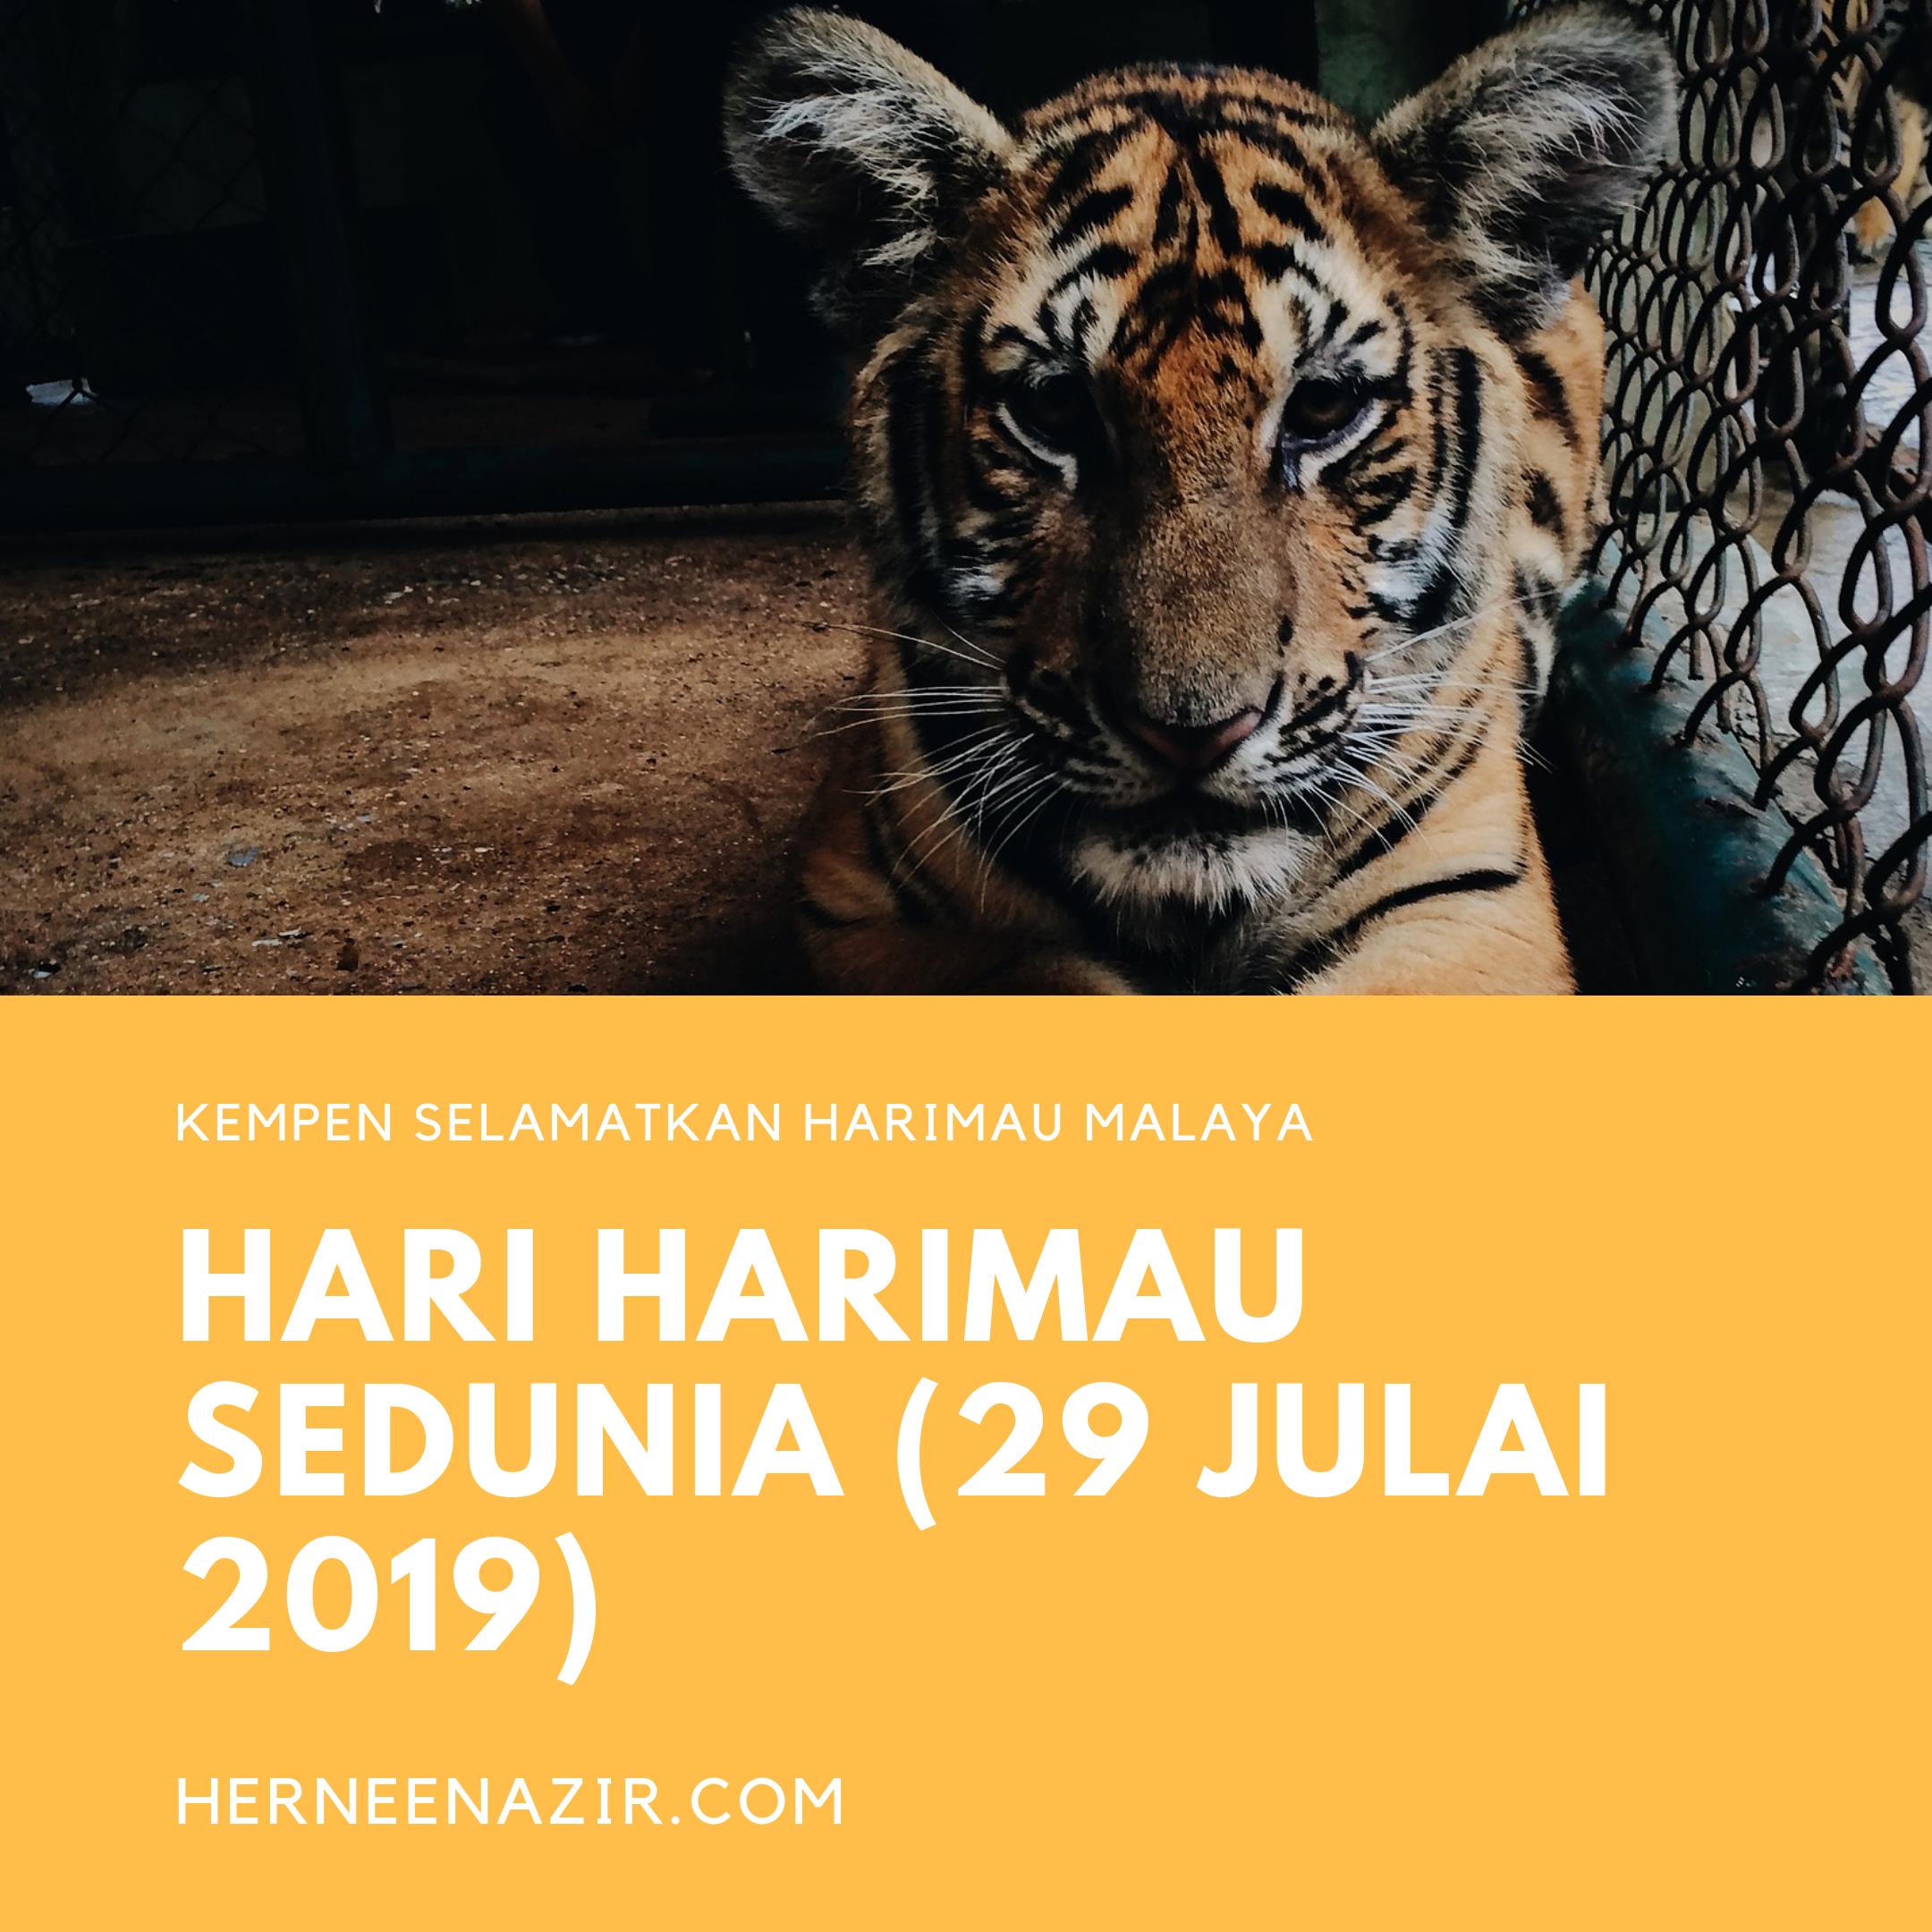 Hari Harimau Sedunia – International Tiger Day 2019 (29 July 2019)